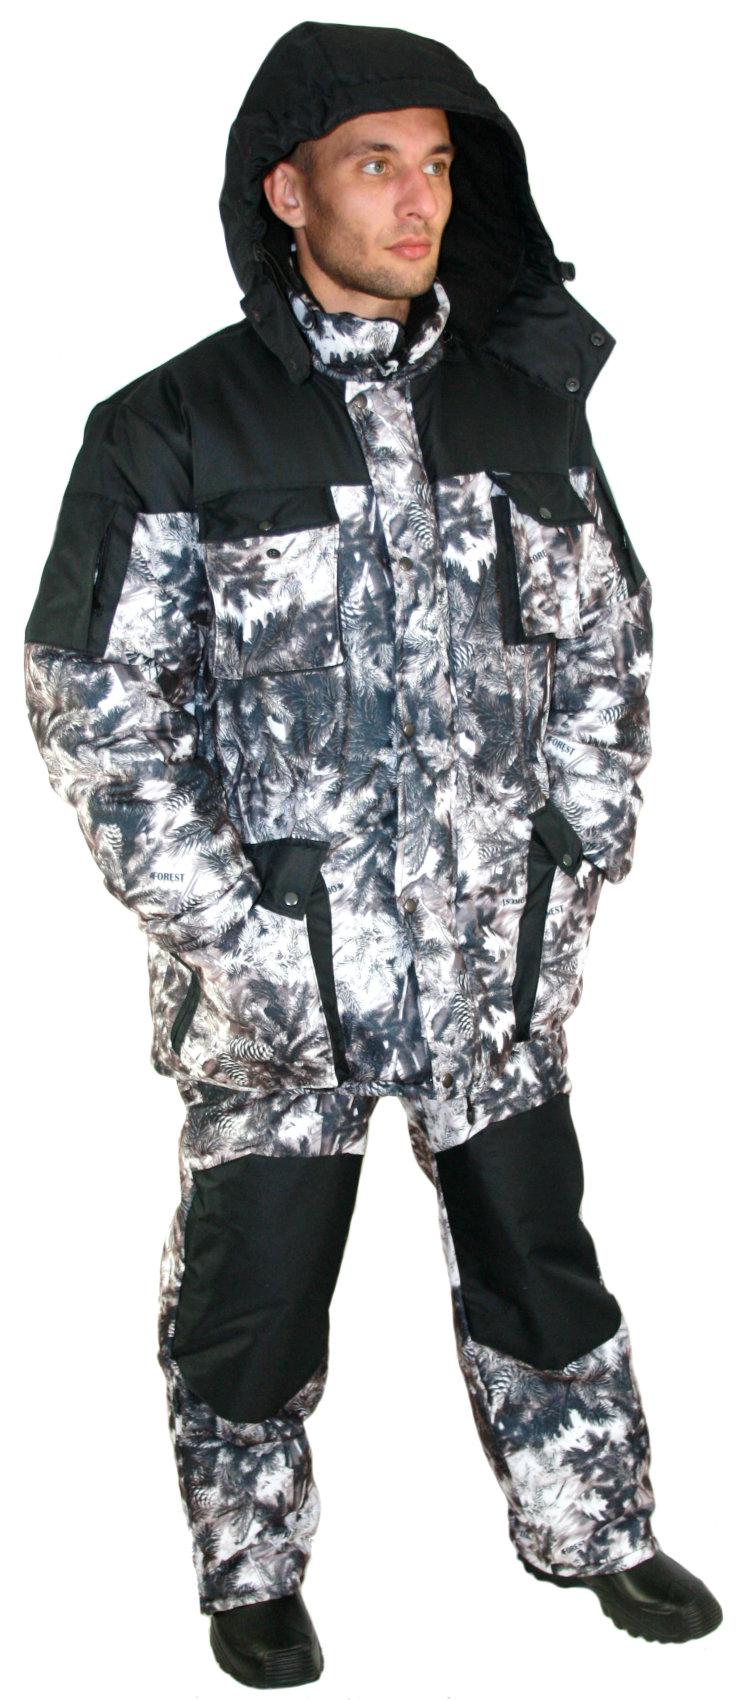 Зимняя одежда для охоты